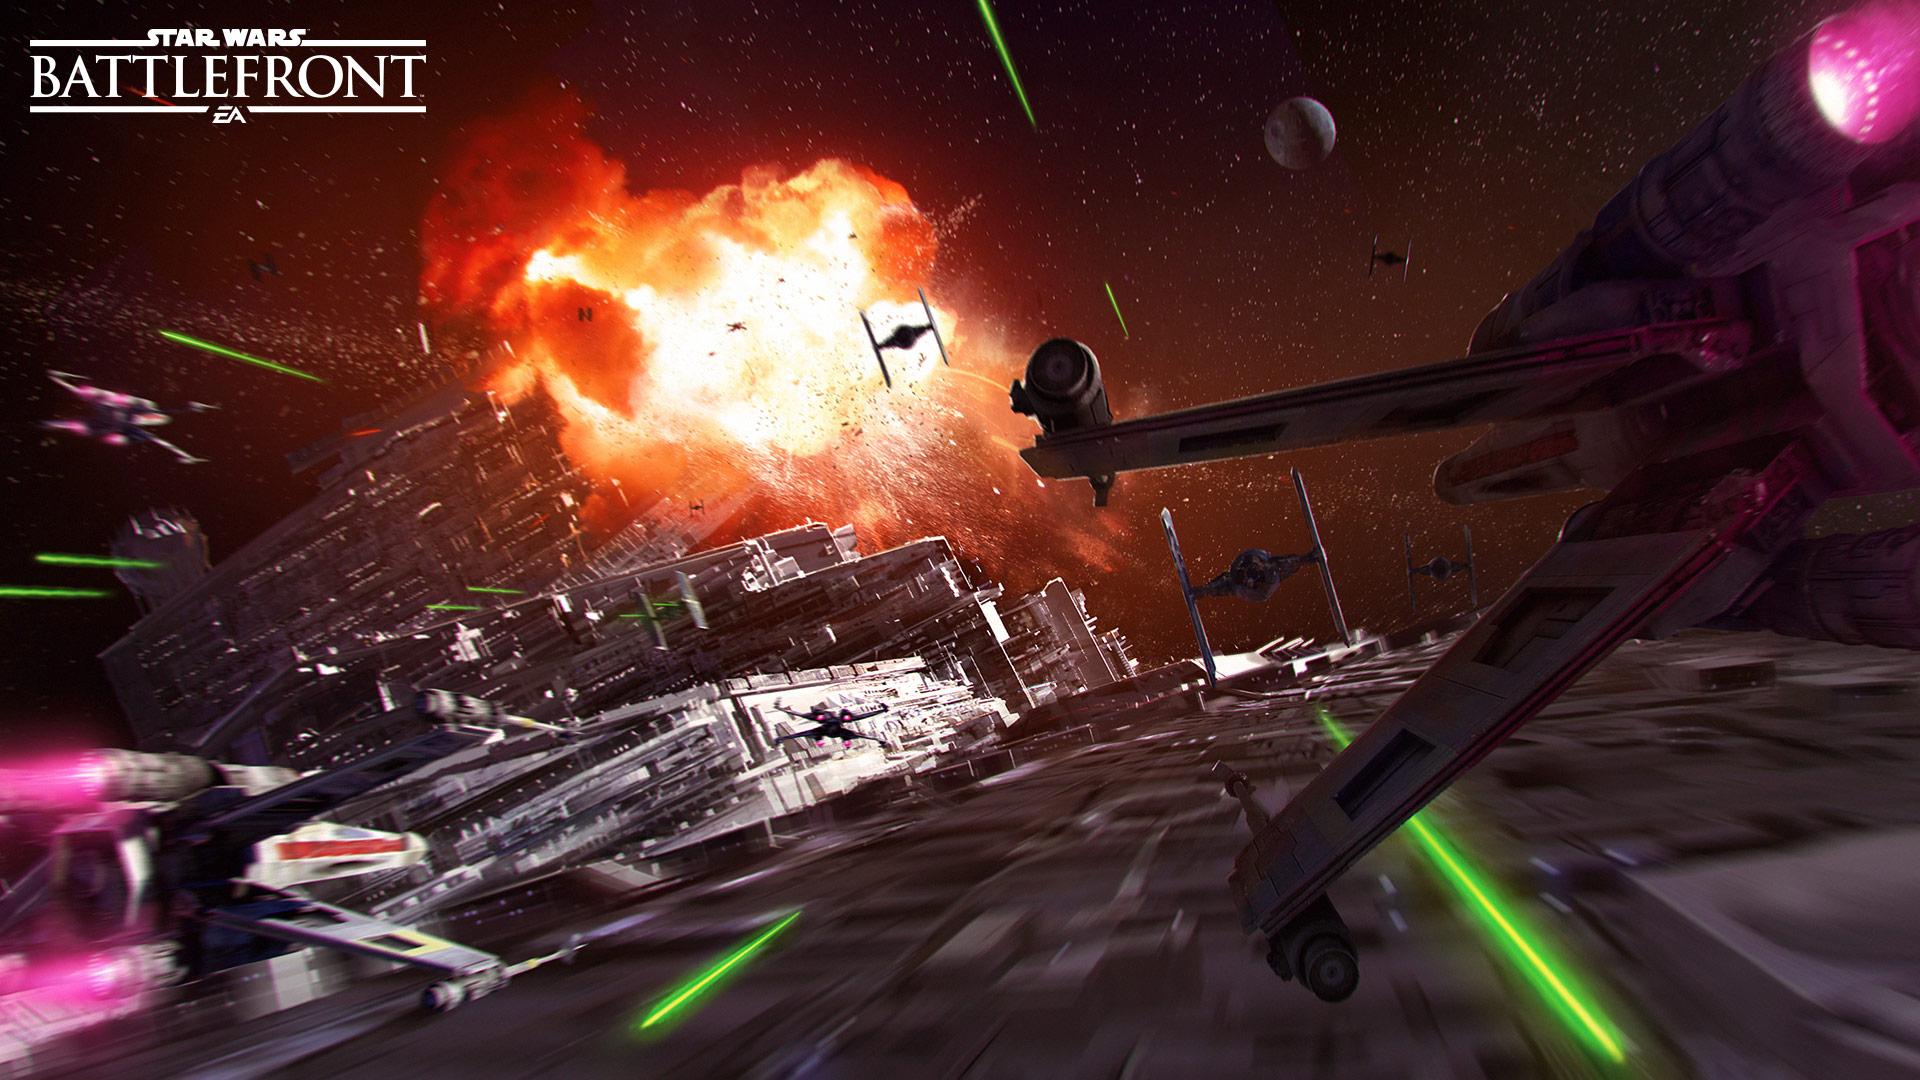 Star Wars Battlefront Death Star Press Kit